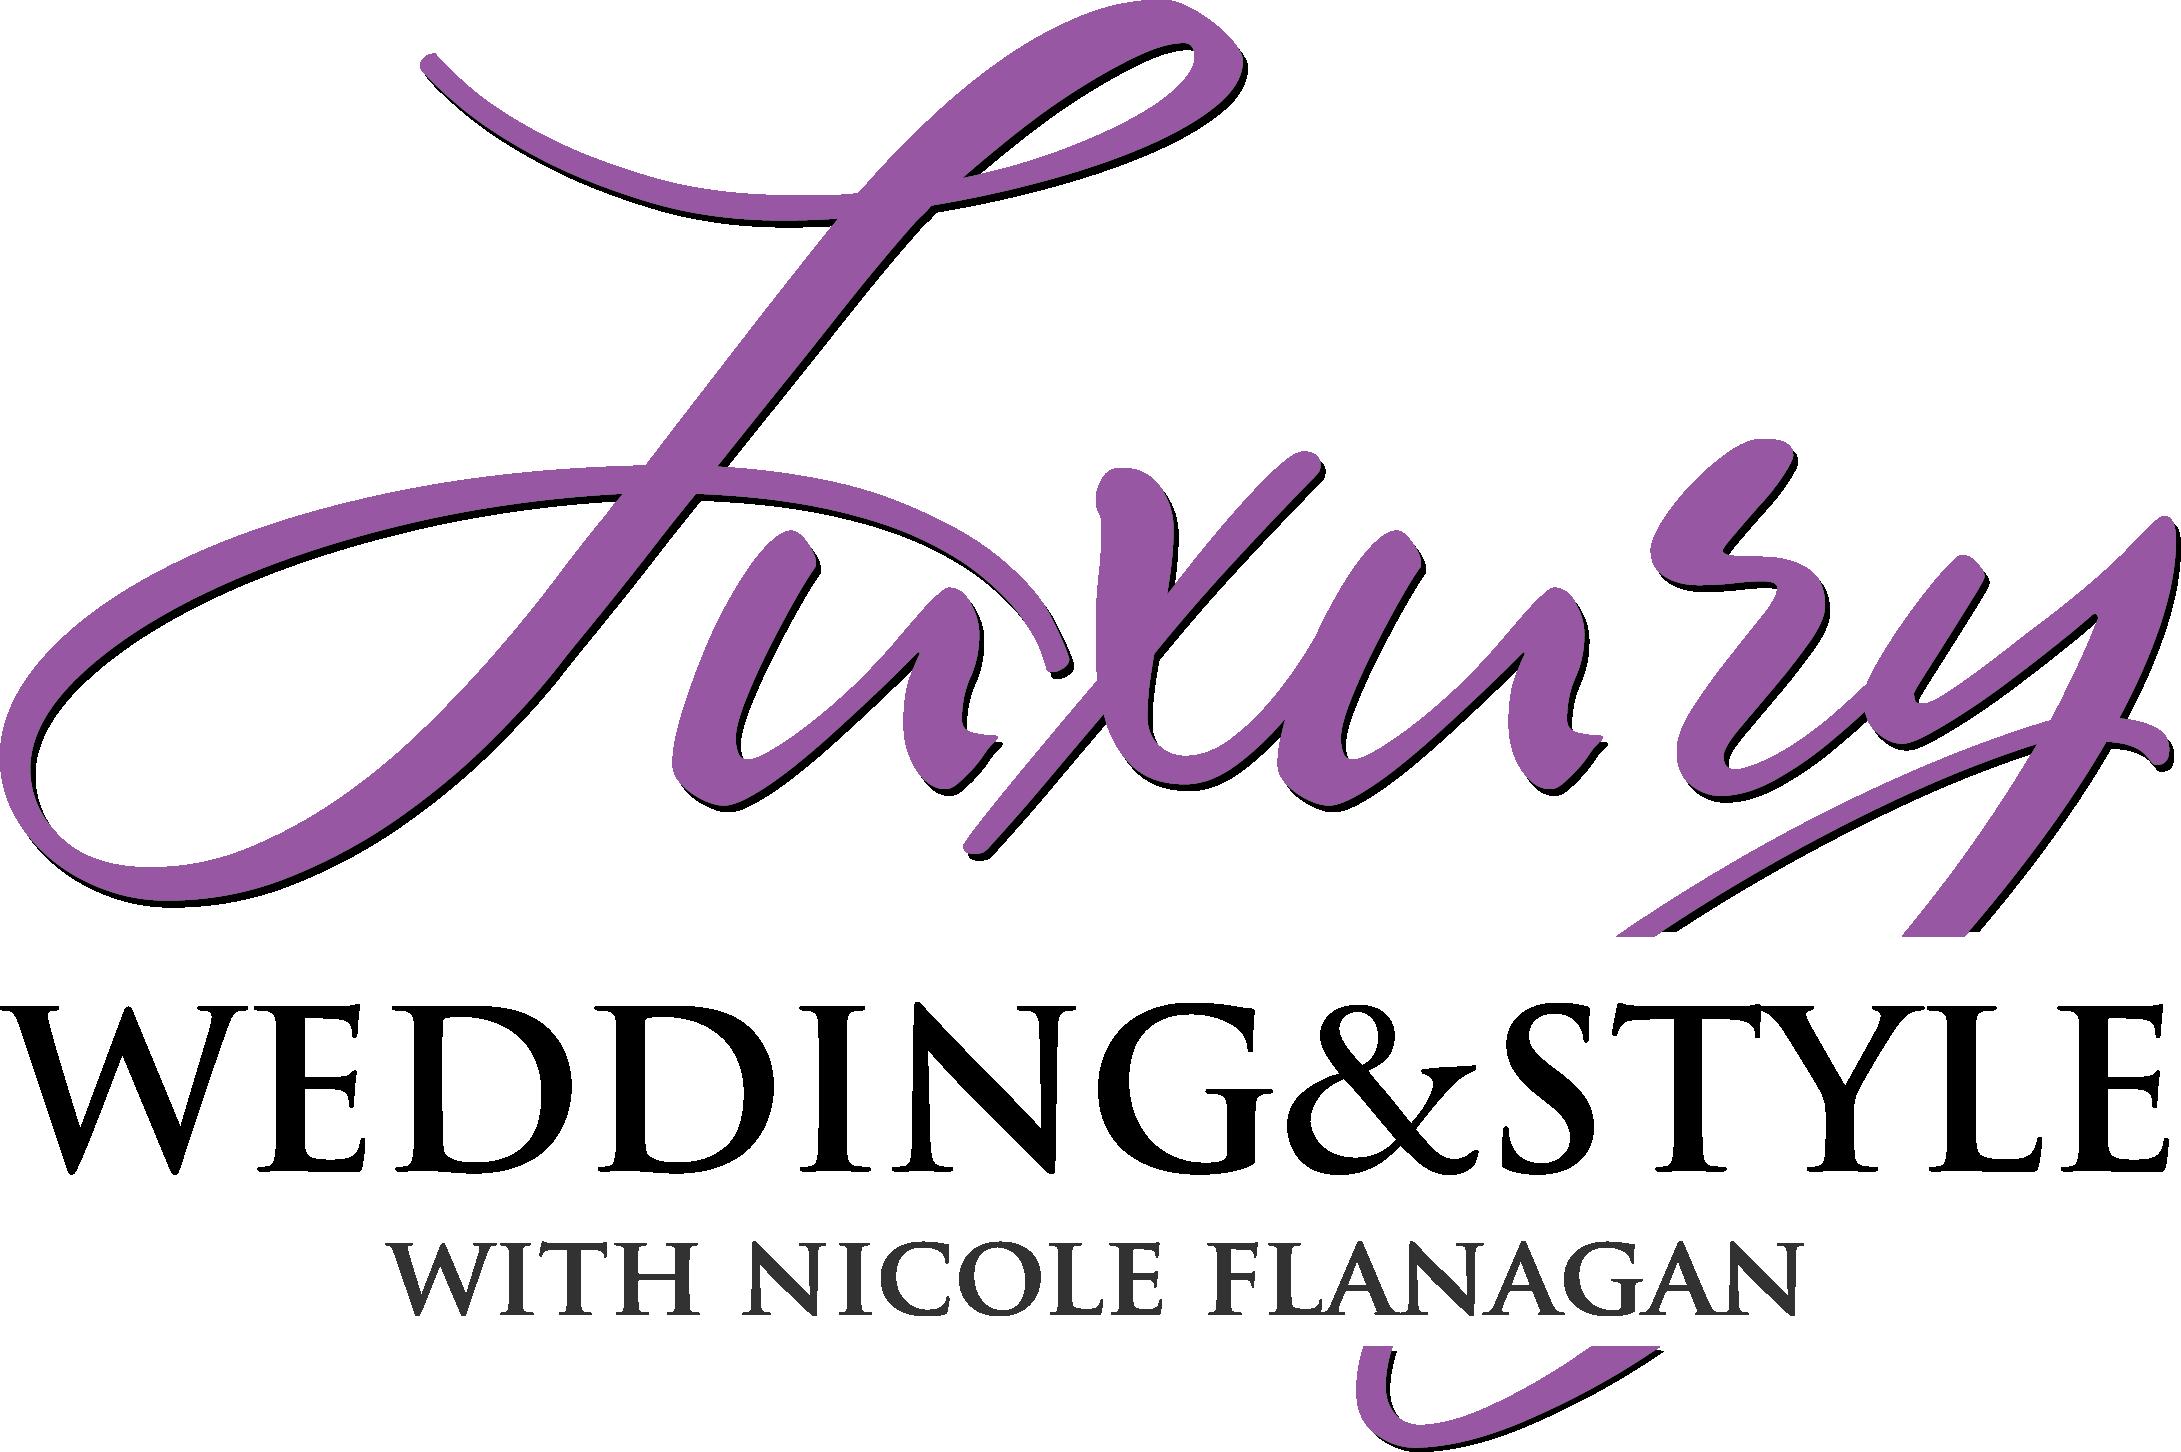 Luxury wedding and style_logo